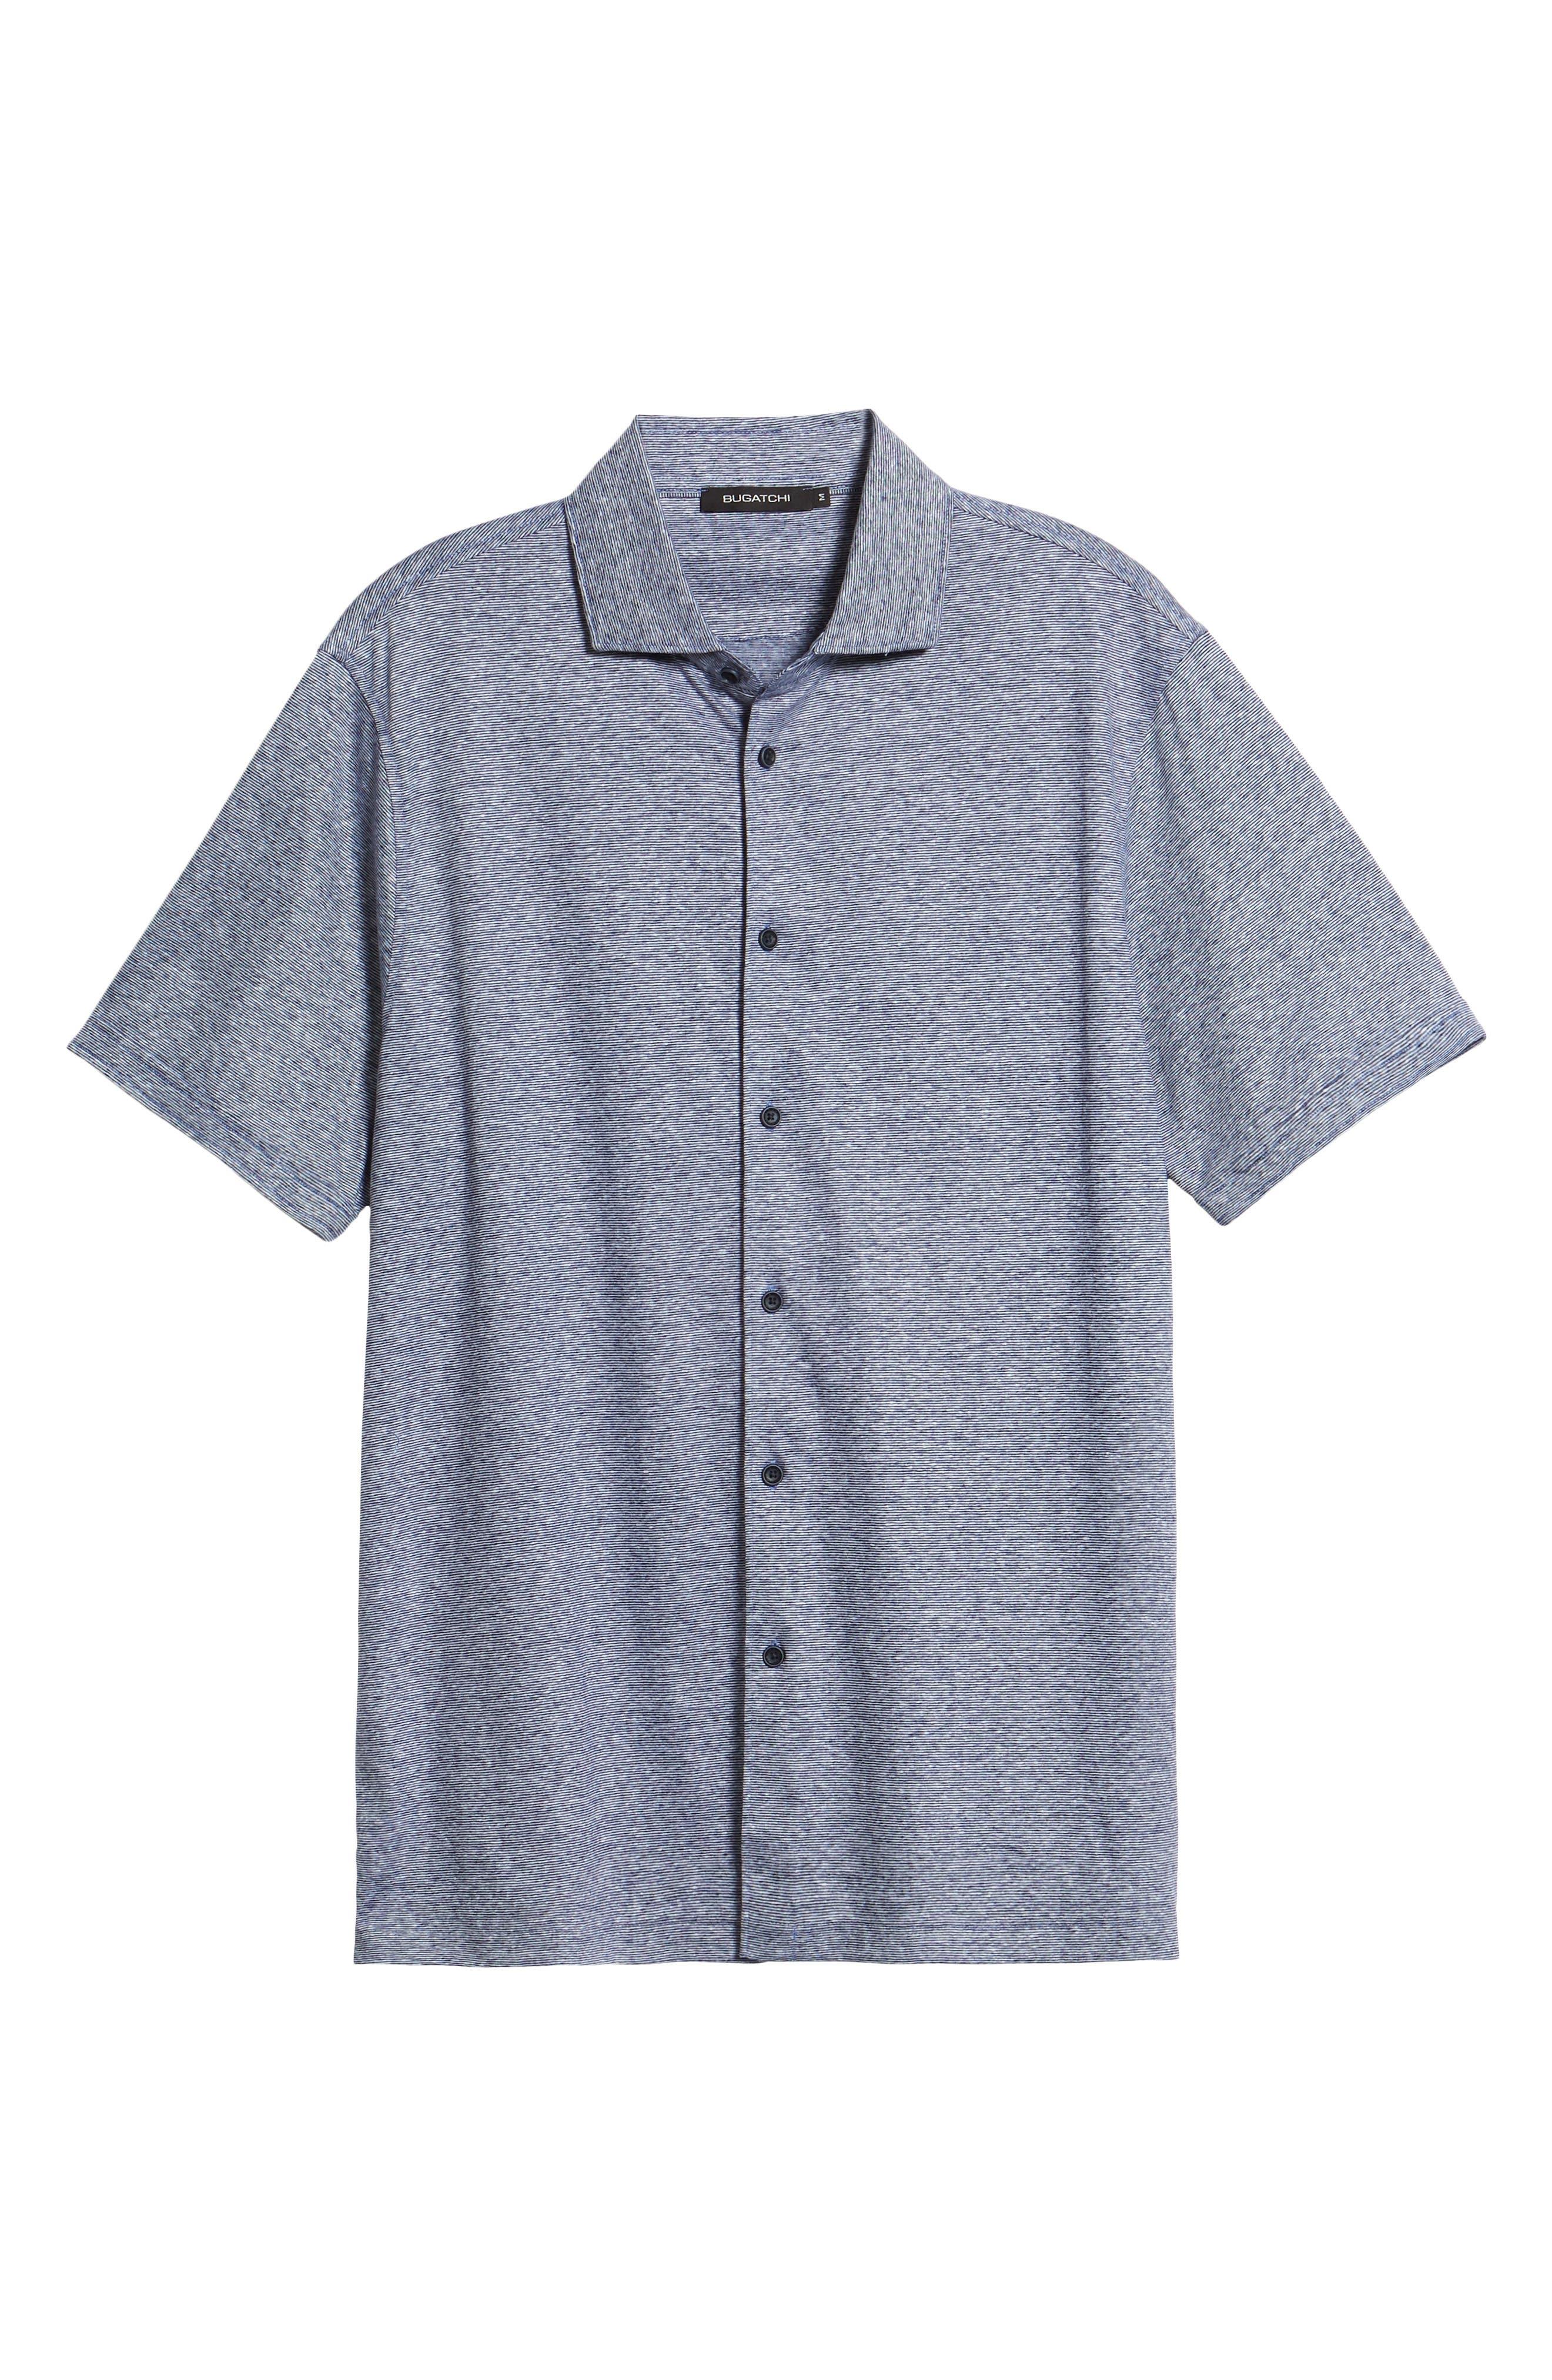 Knit Sport Shirt,                             Alternate thumbnail 6, color,                             Navy